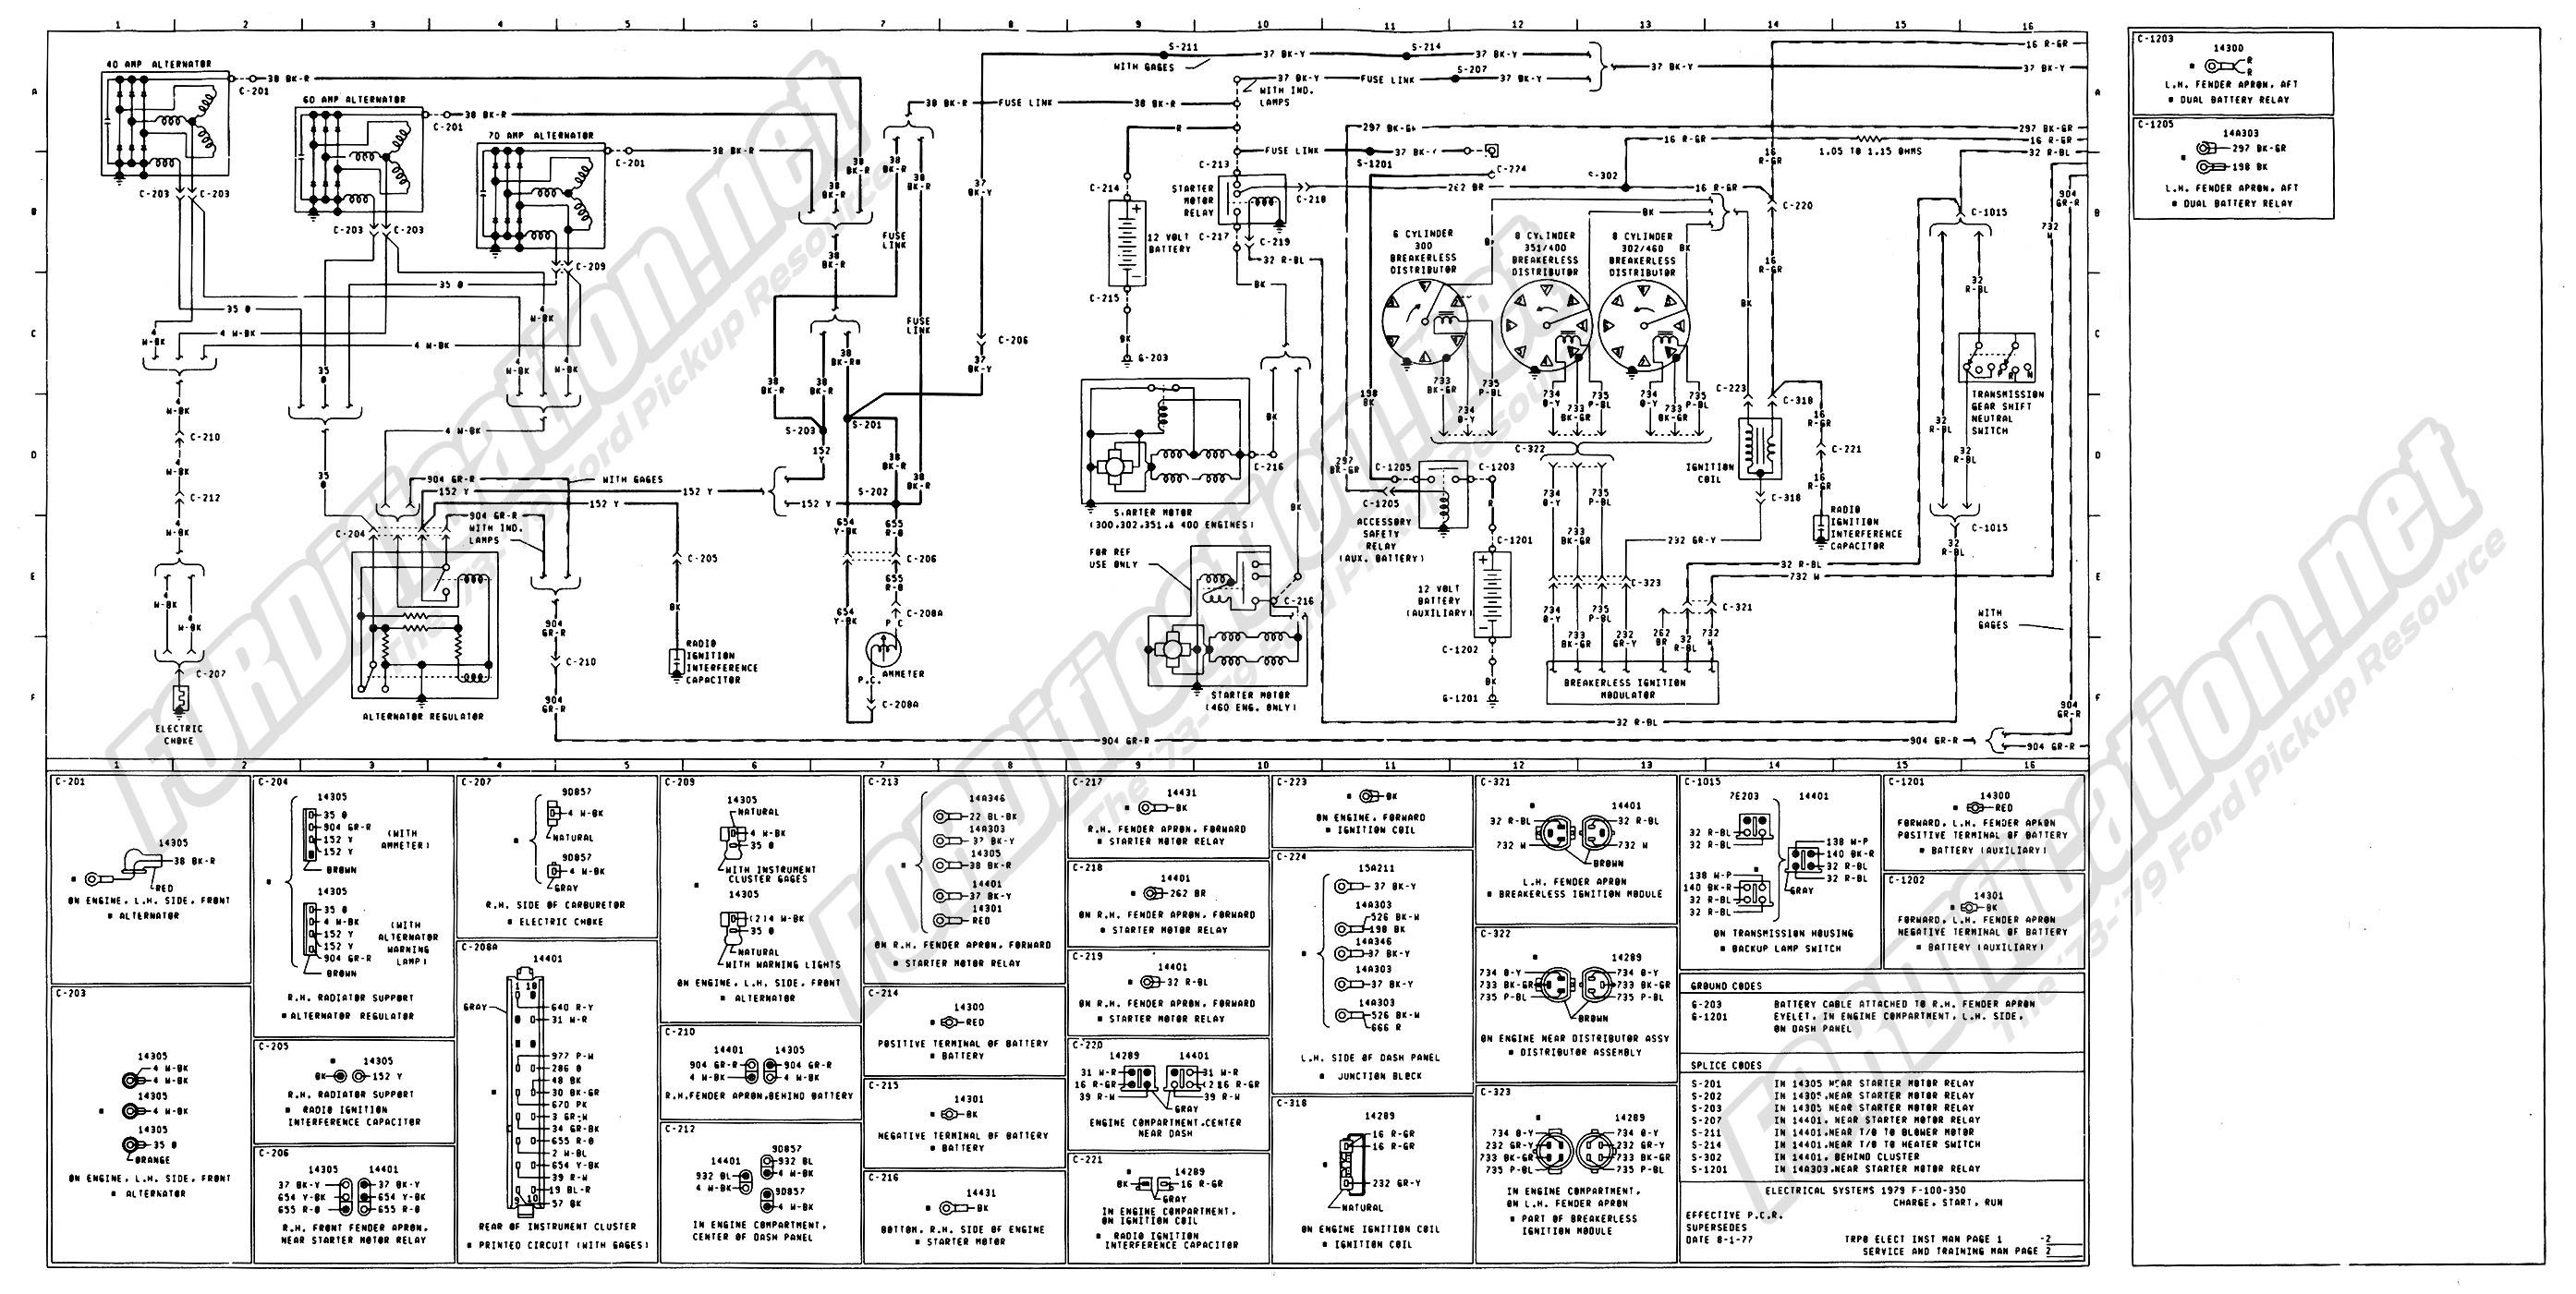 1986 toyota Pickup Engine Diagram 1986 ford Alternator Wiring Trusted Wiring Diagram Of 1986 toyota Pickup Engine Diagram